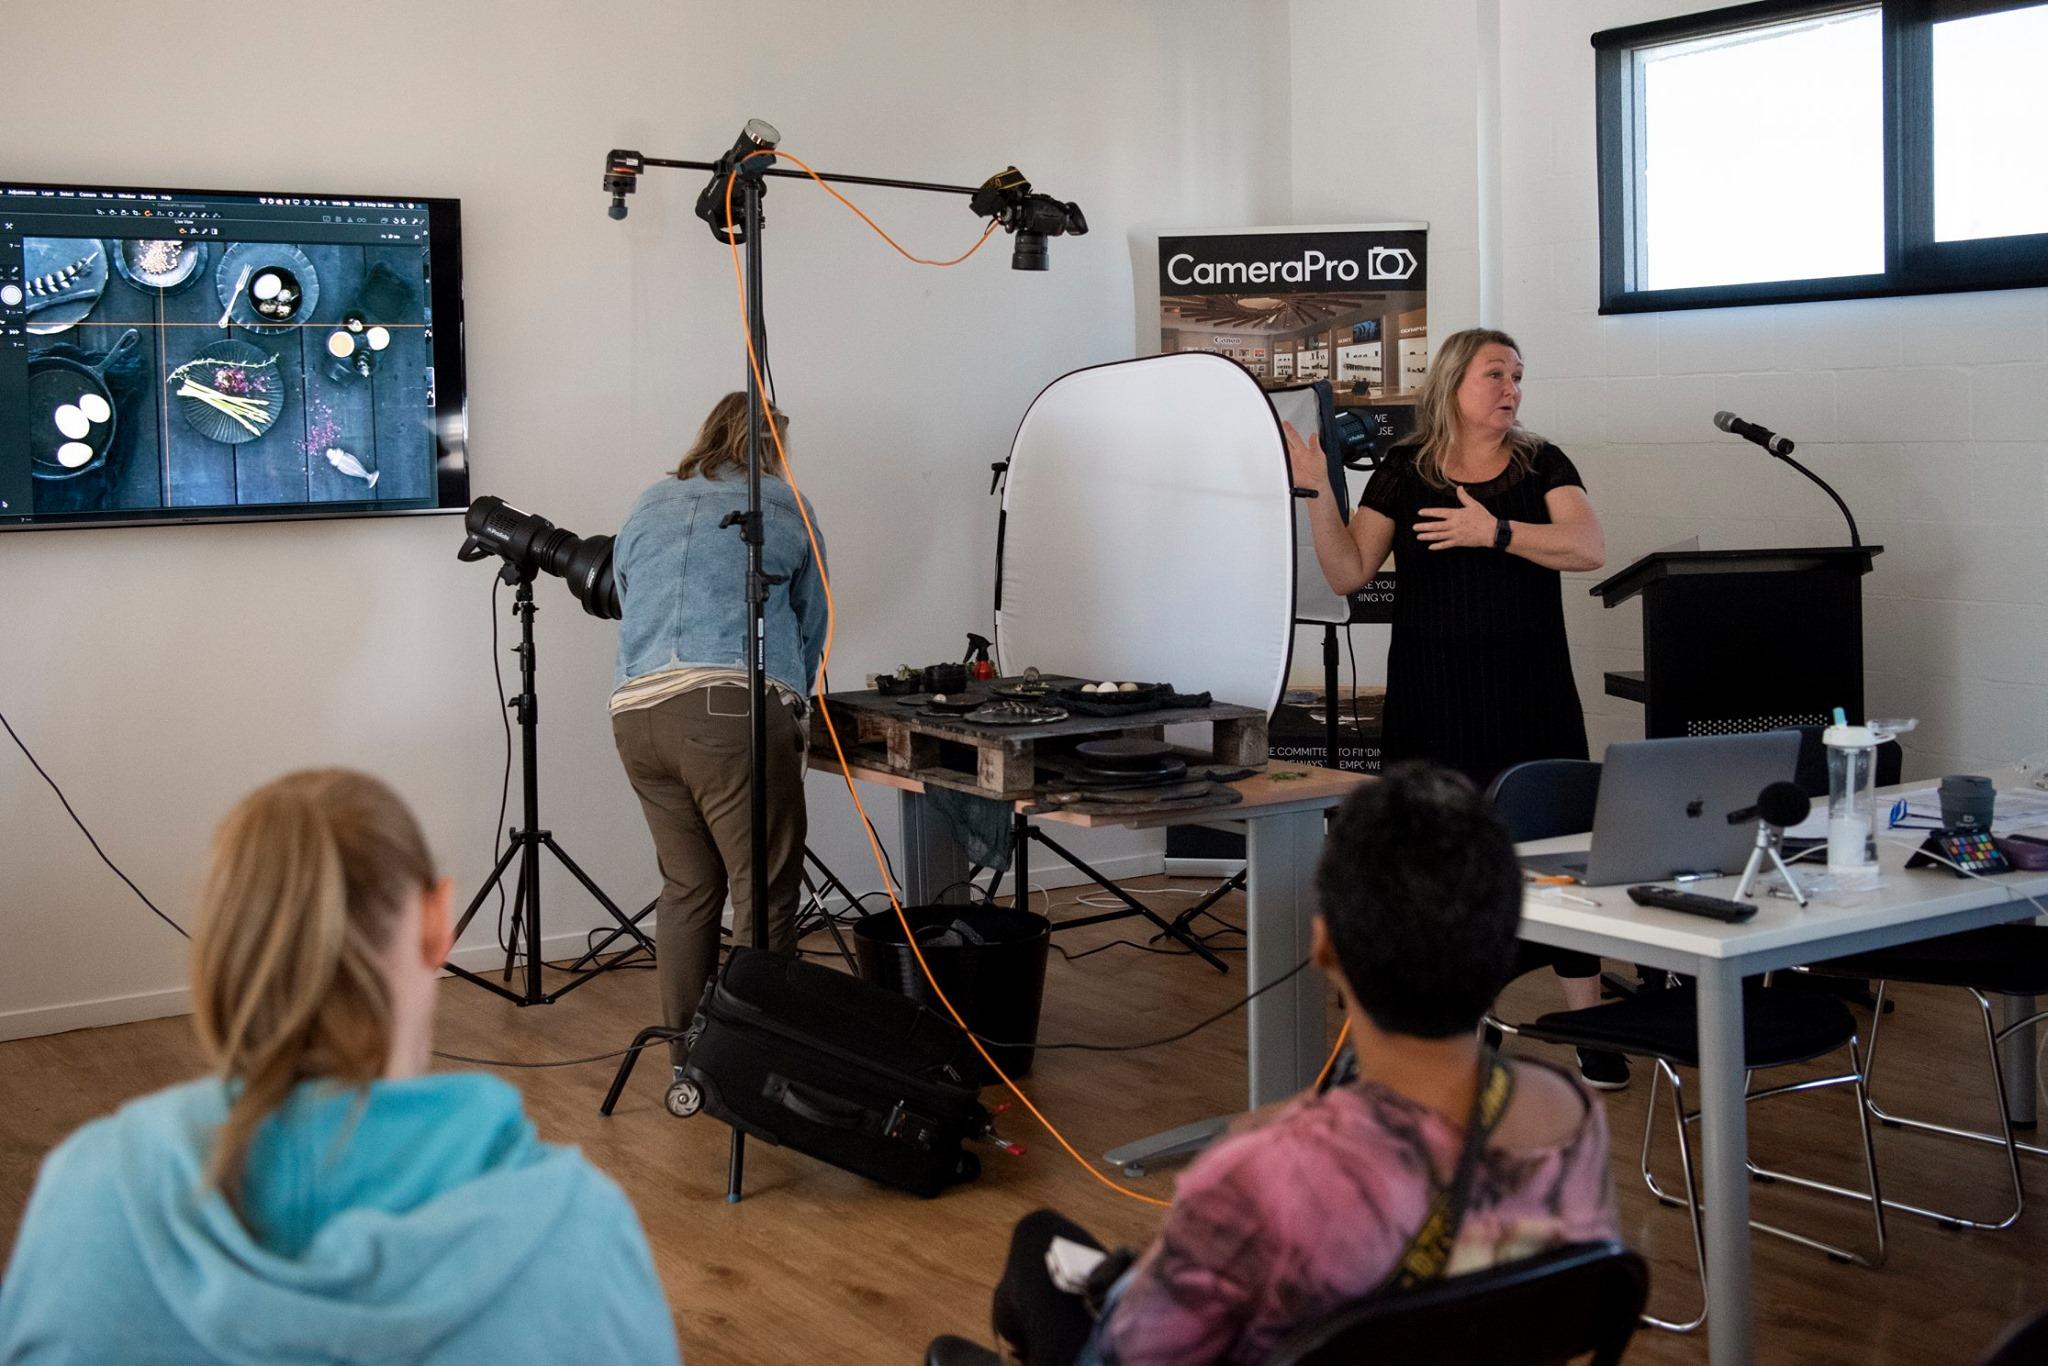 food photography seminar with nadine shaw